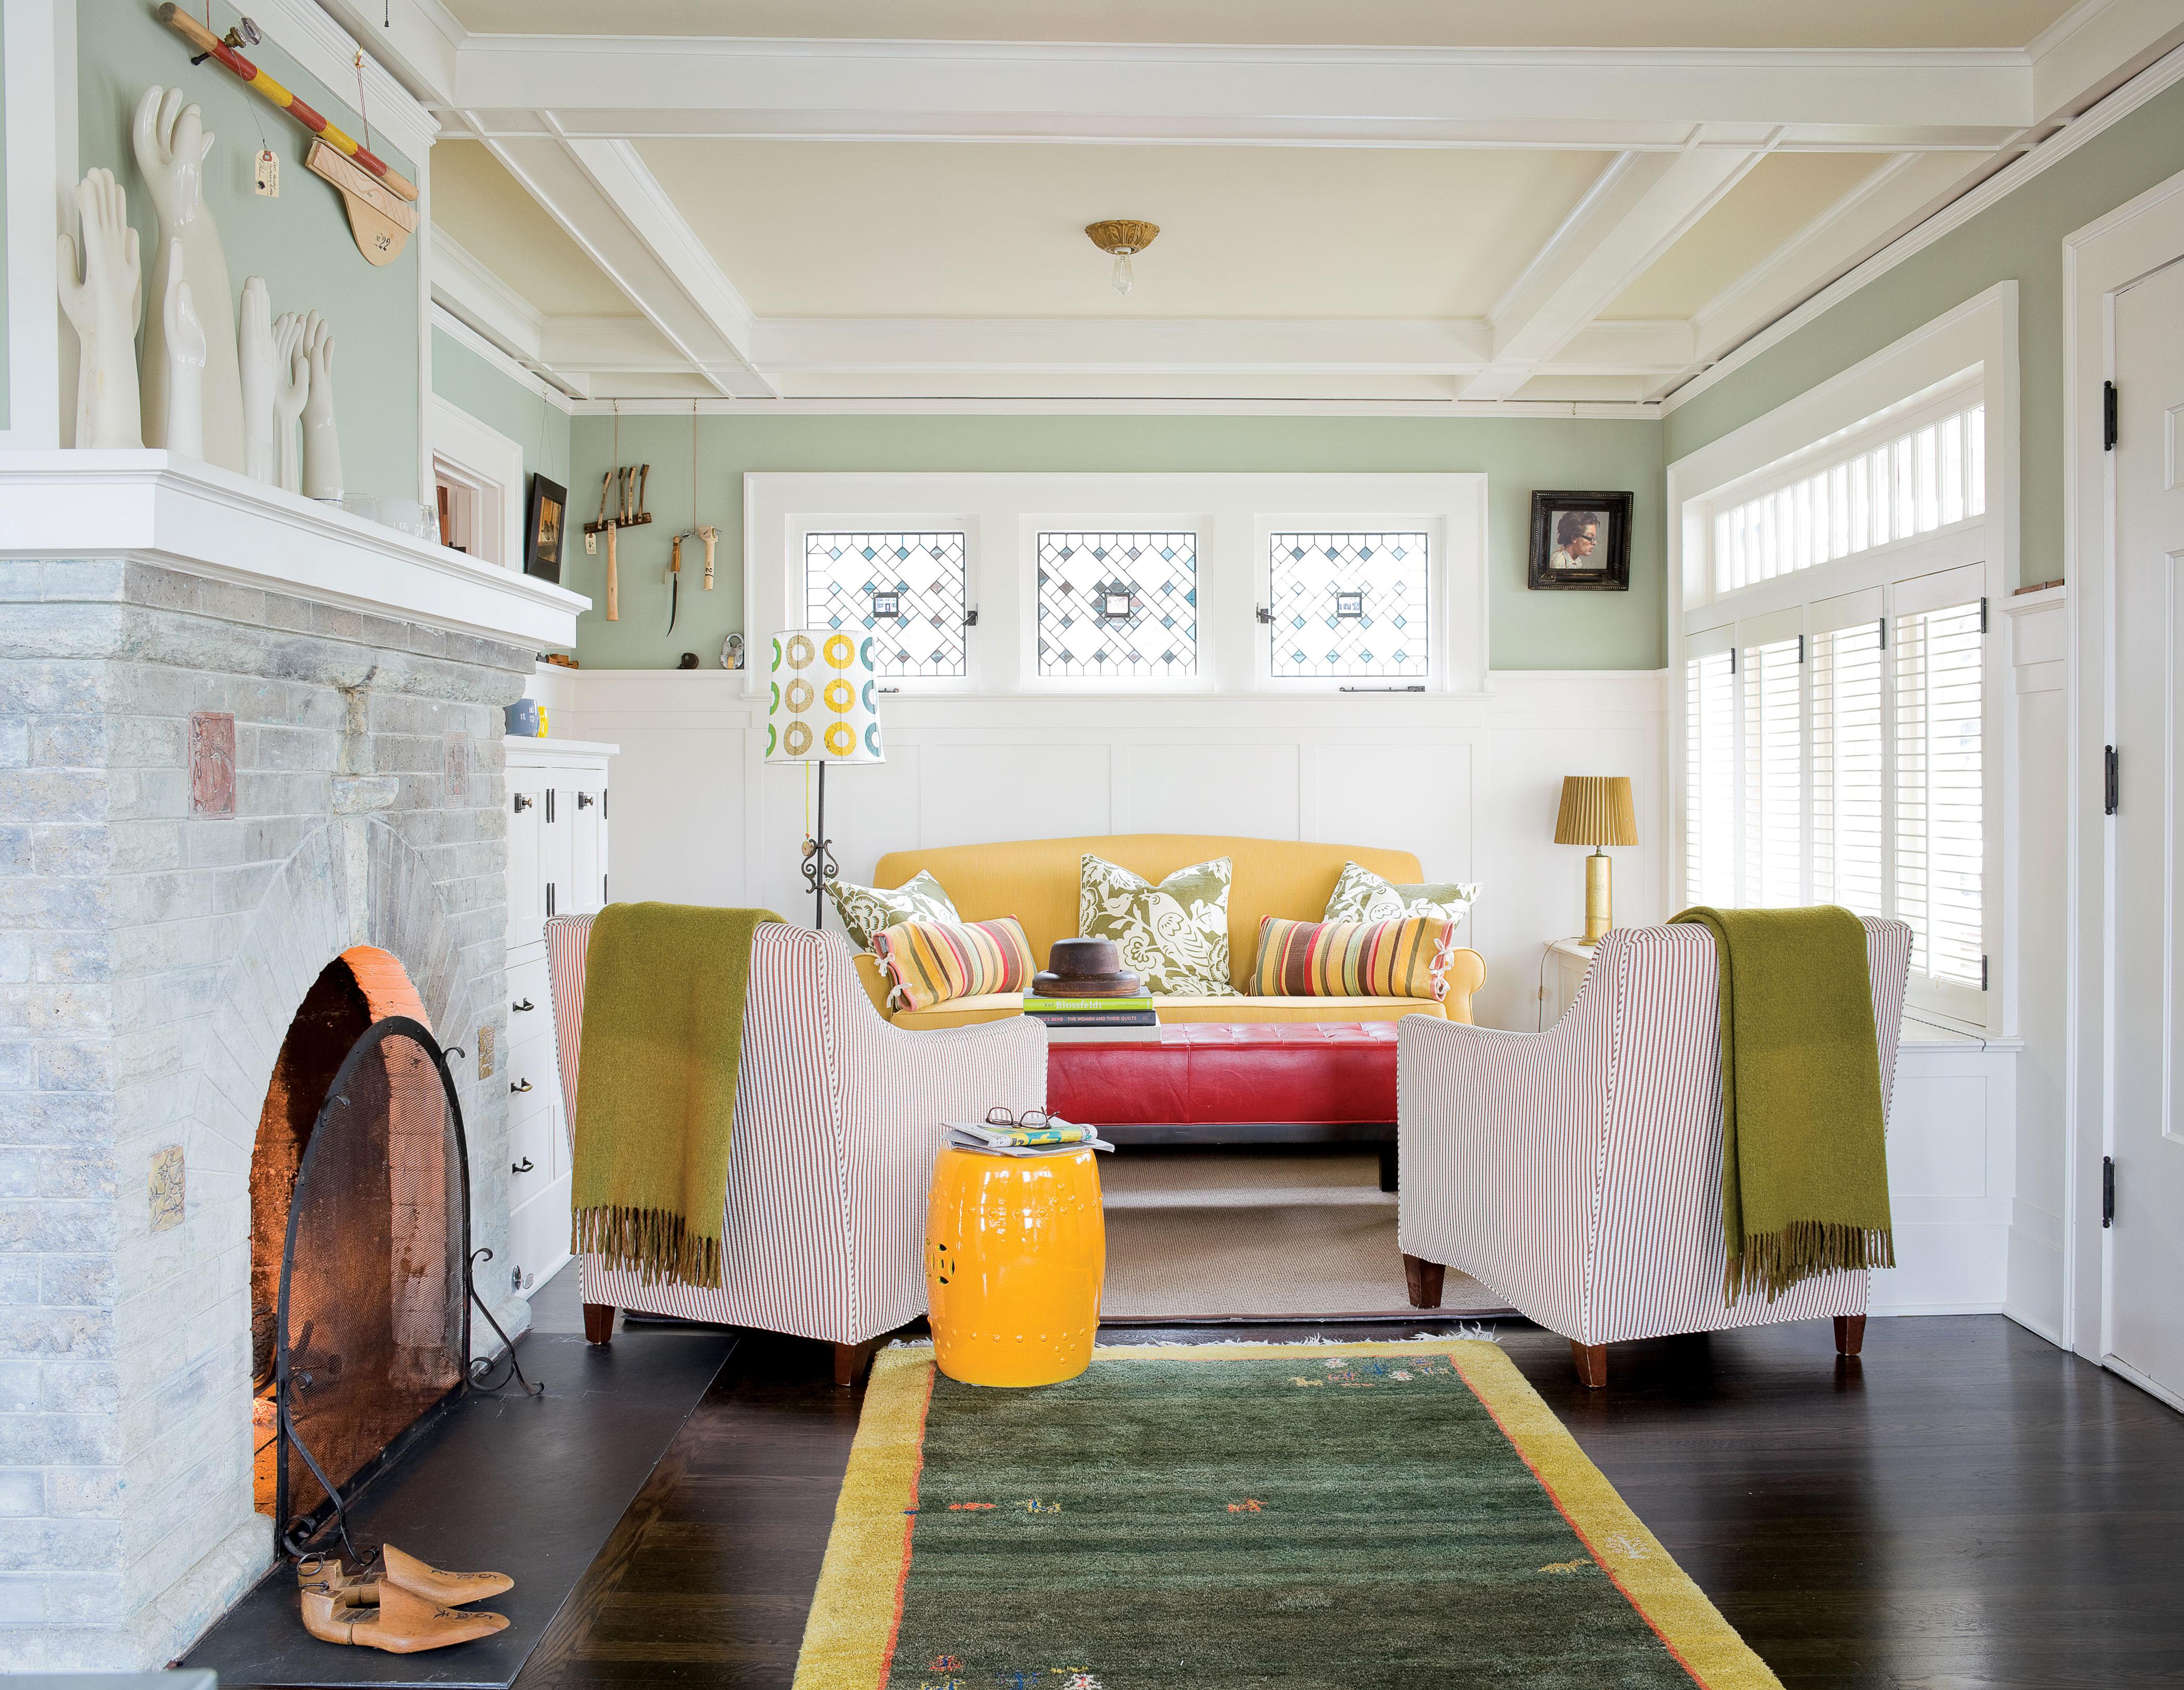 10 Ways to Make Your Sofa the Star - Sunset Magazine